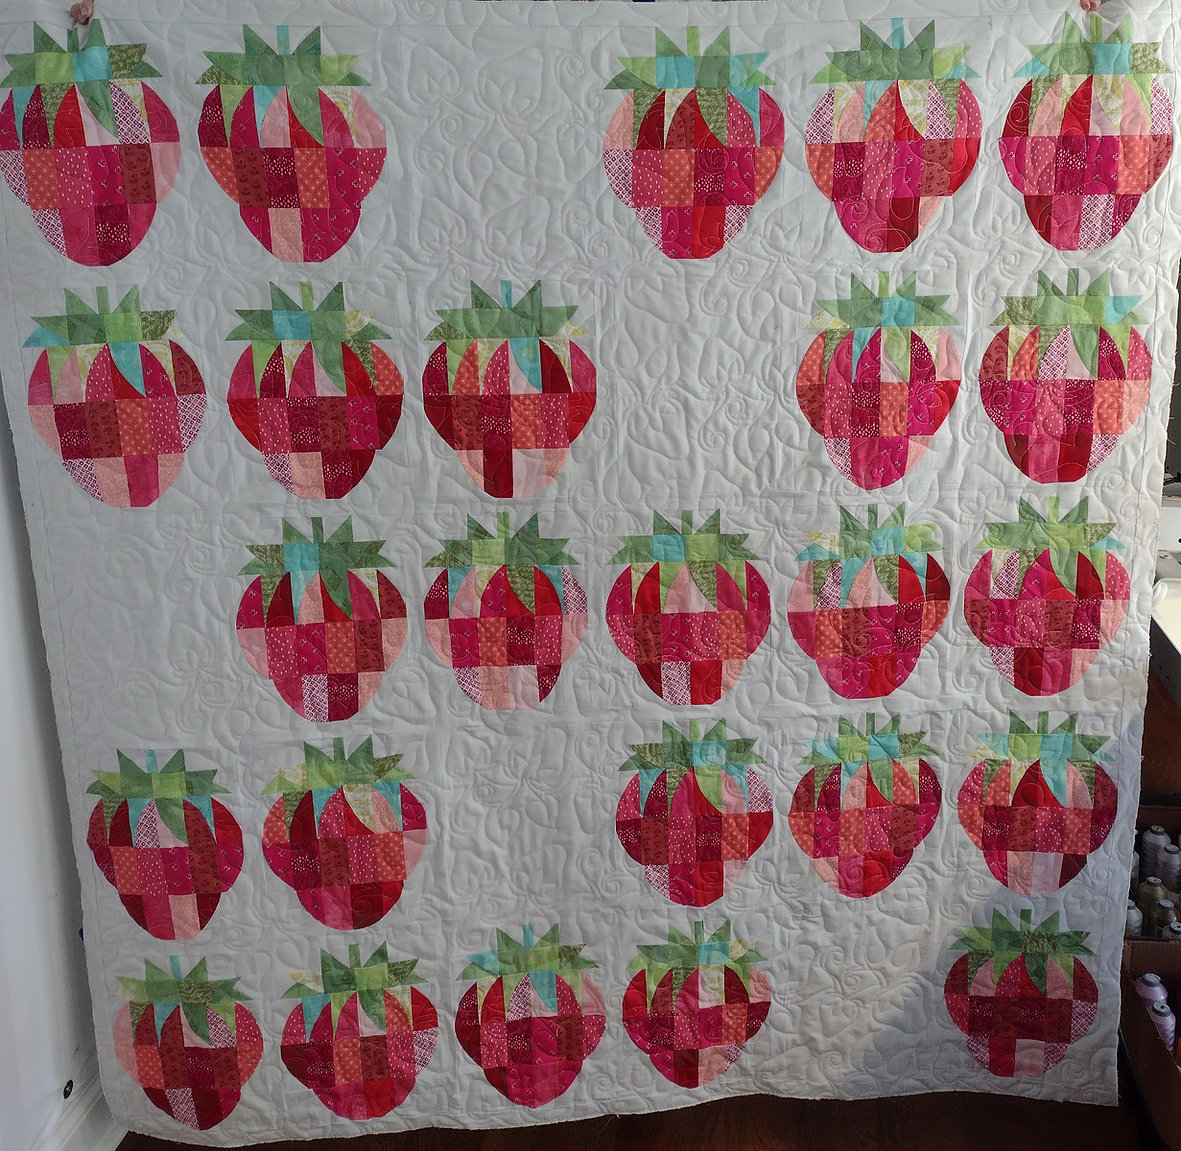 Hunter's%20Strawberries%20Patch%20(3)_edited.jpg